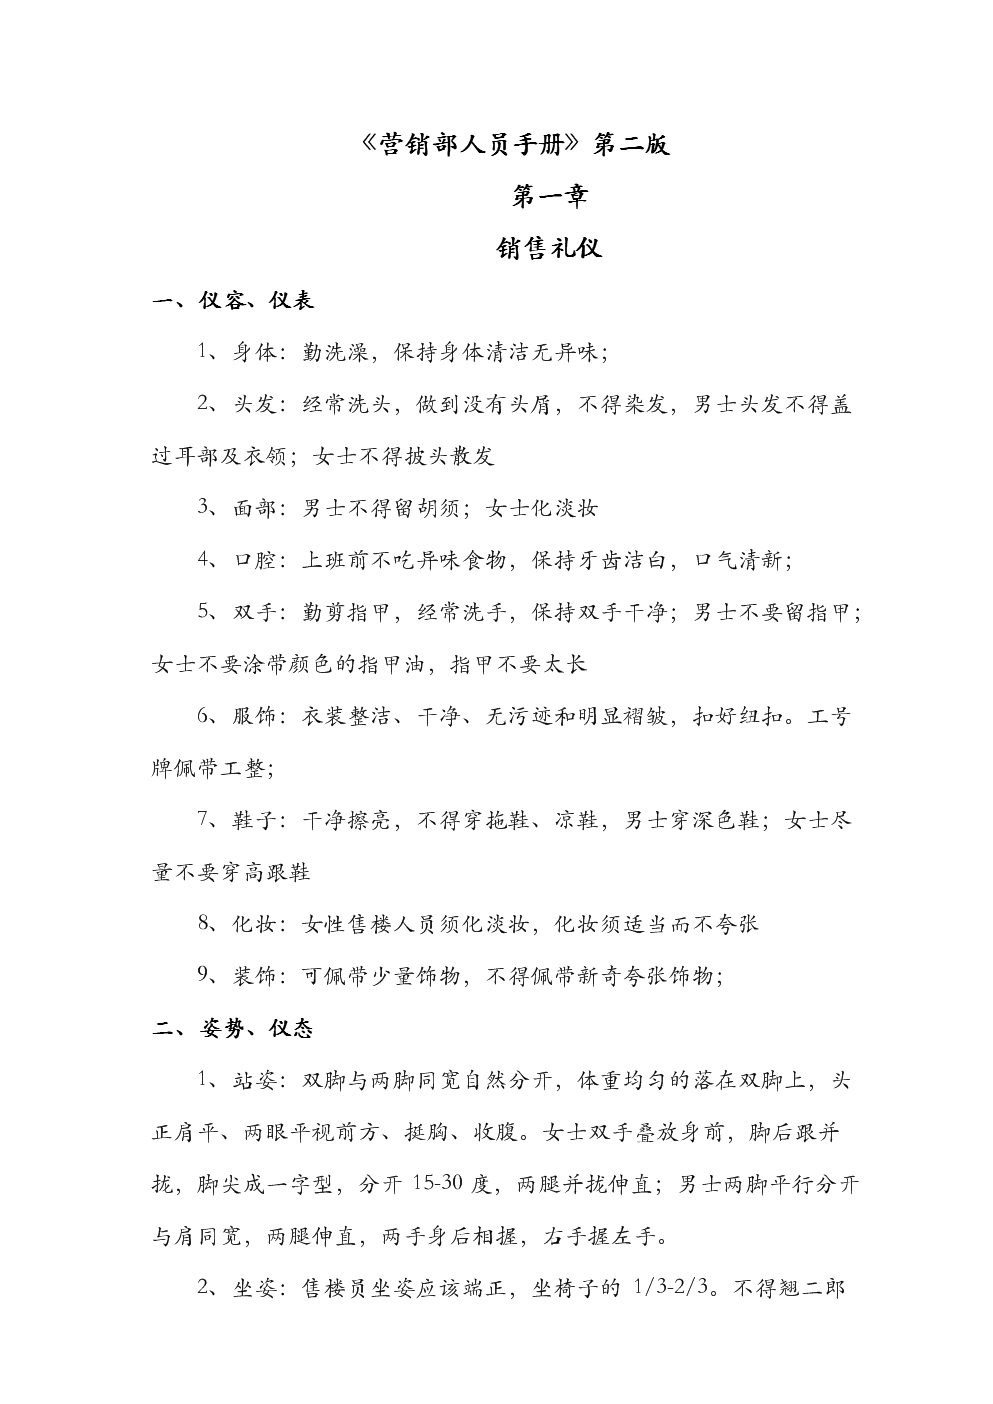 XX地产公司营销部人员手册.doc